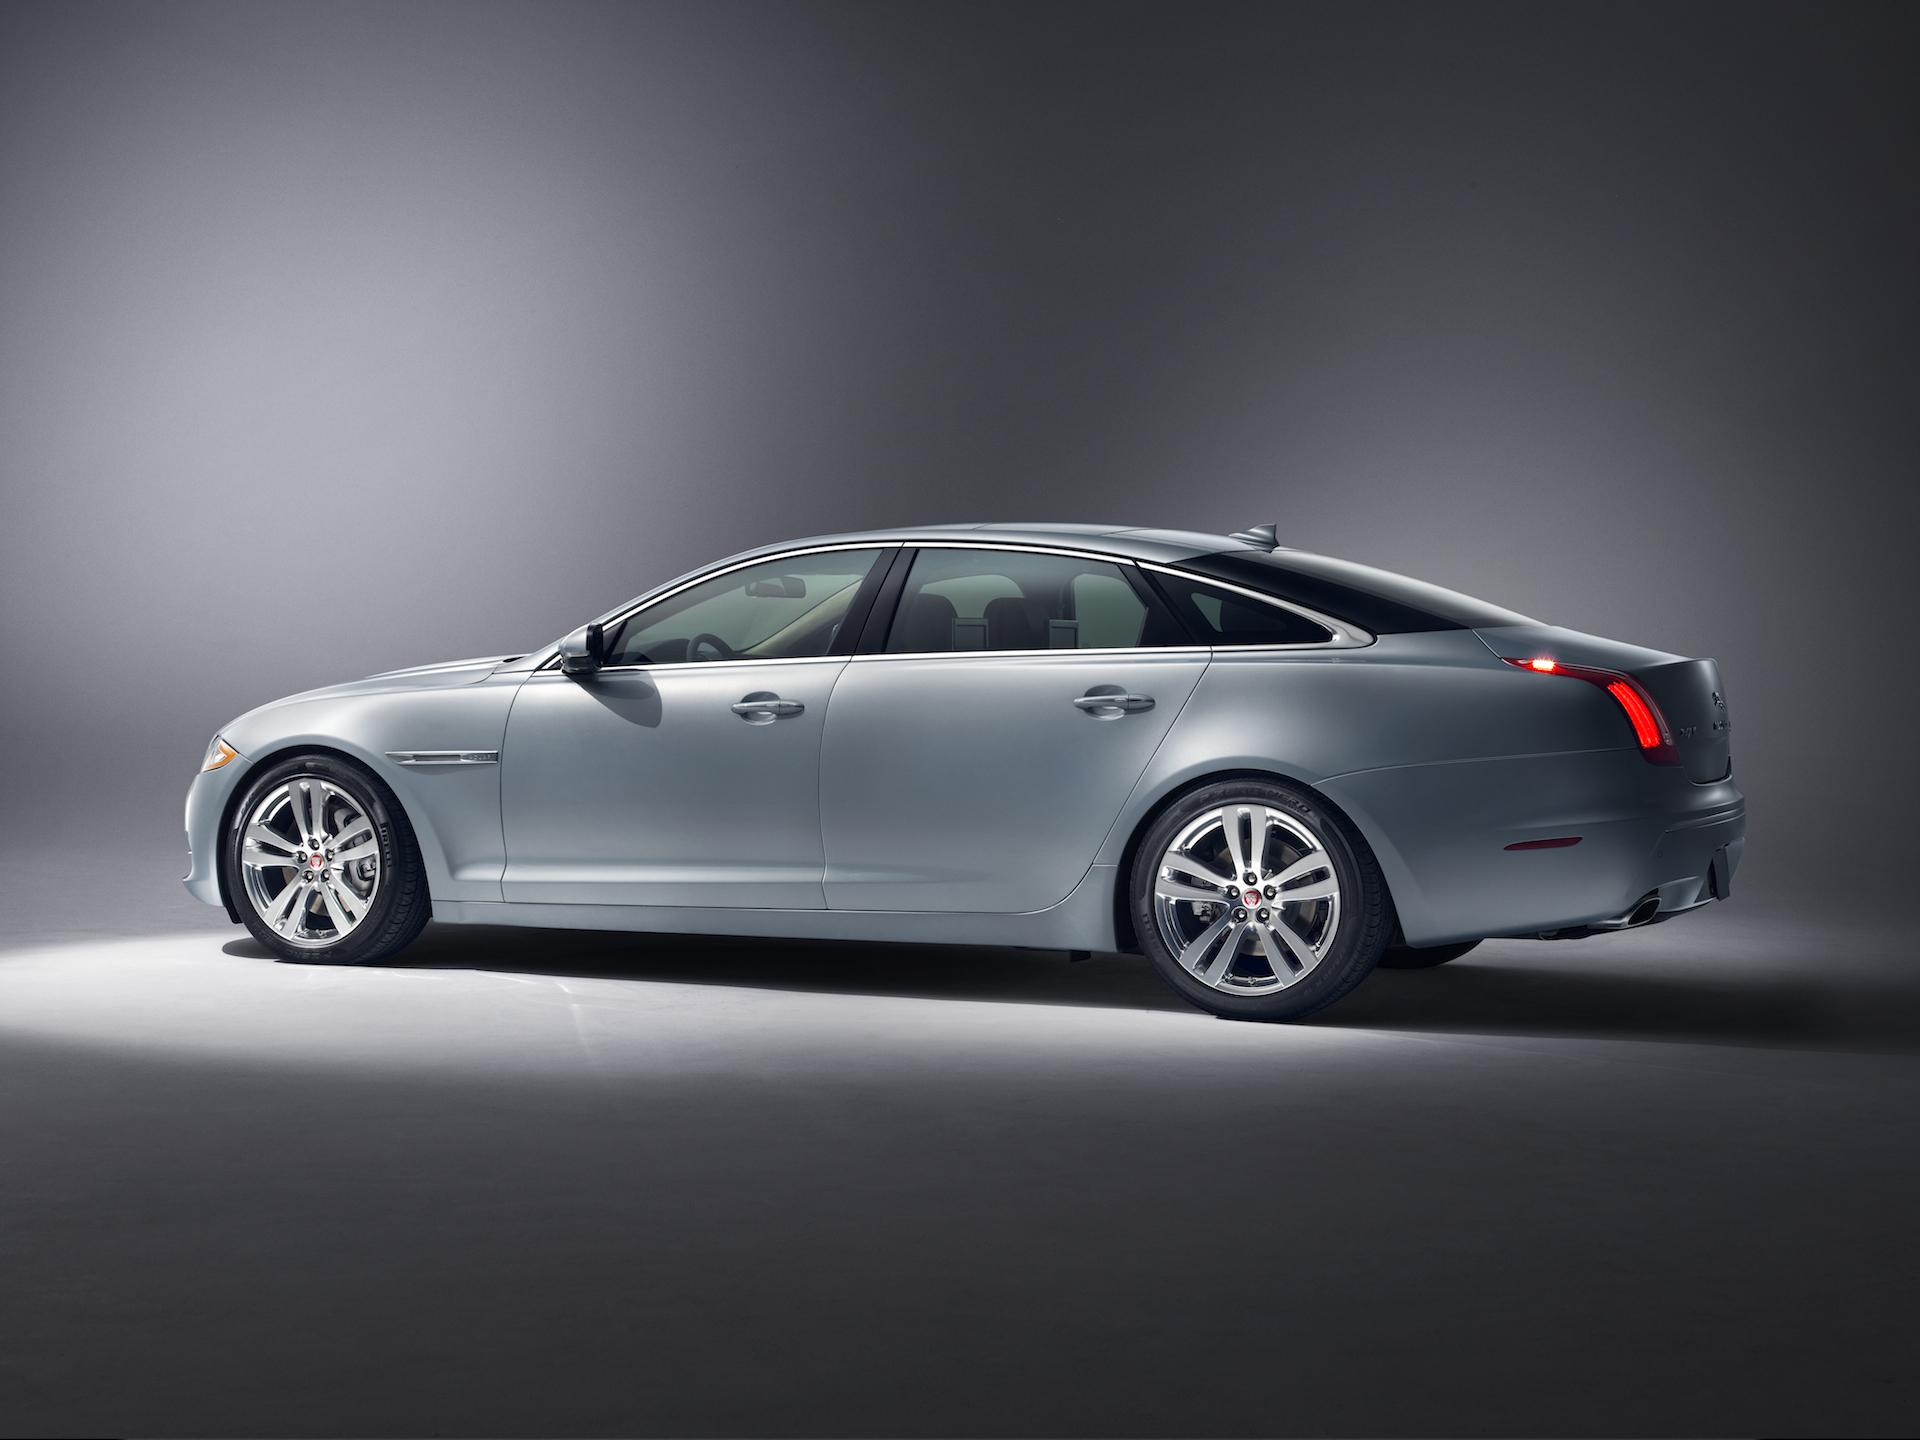 2017 jaguar xj review redesign price 2017 2018 car reviews - 2015 Jaguar Xj Safety Review And Crash Test Ratings The Car Connection